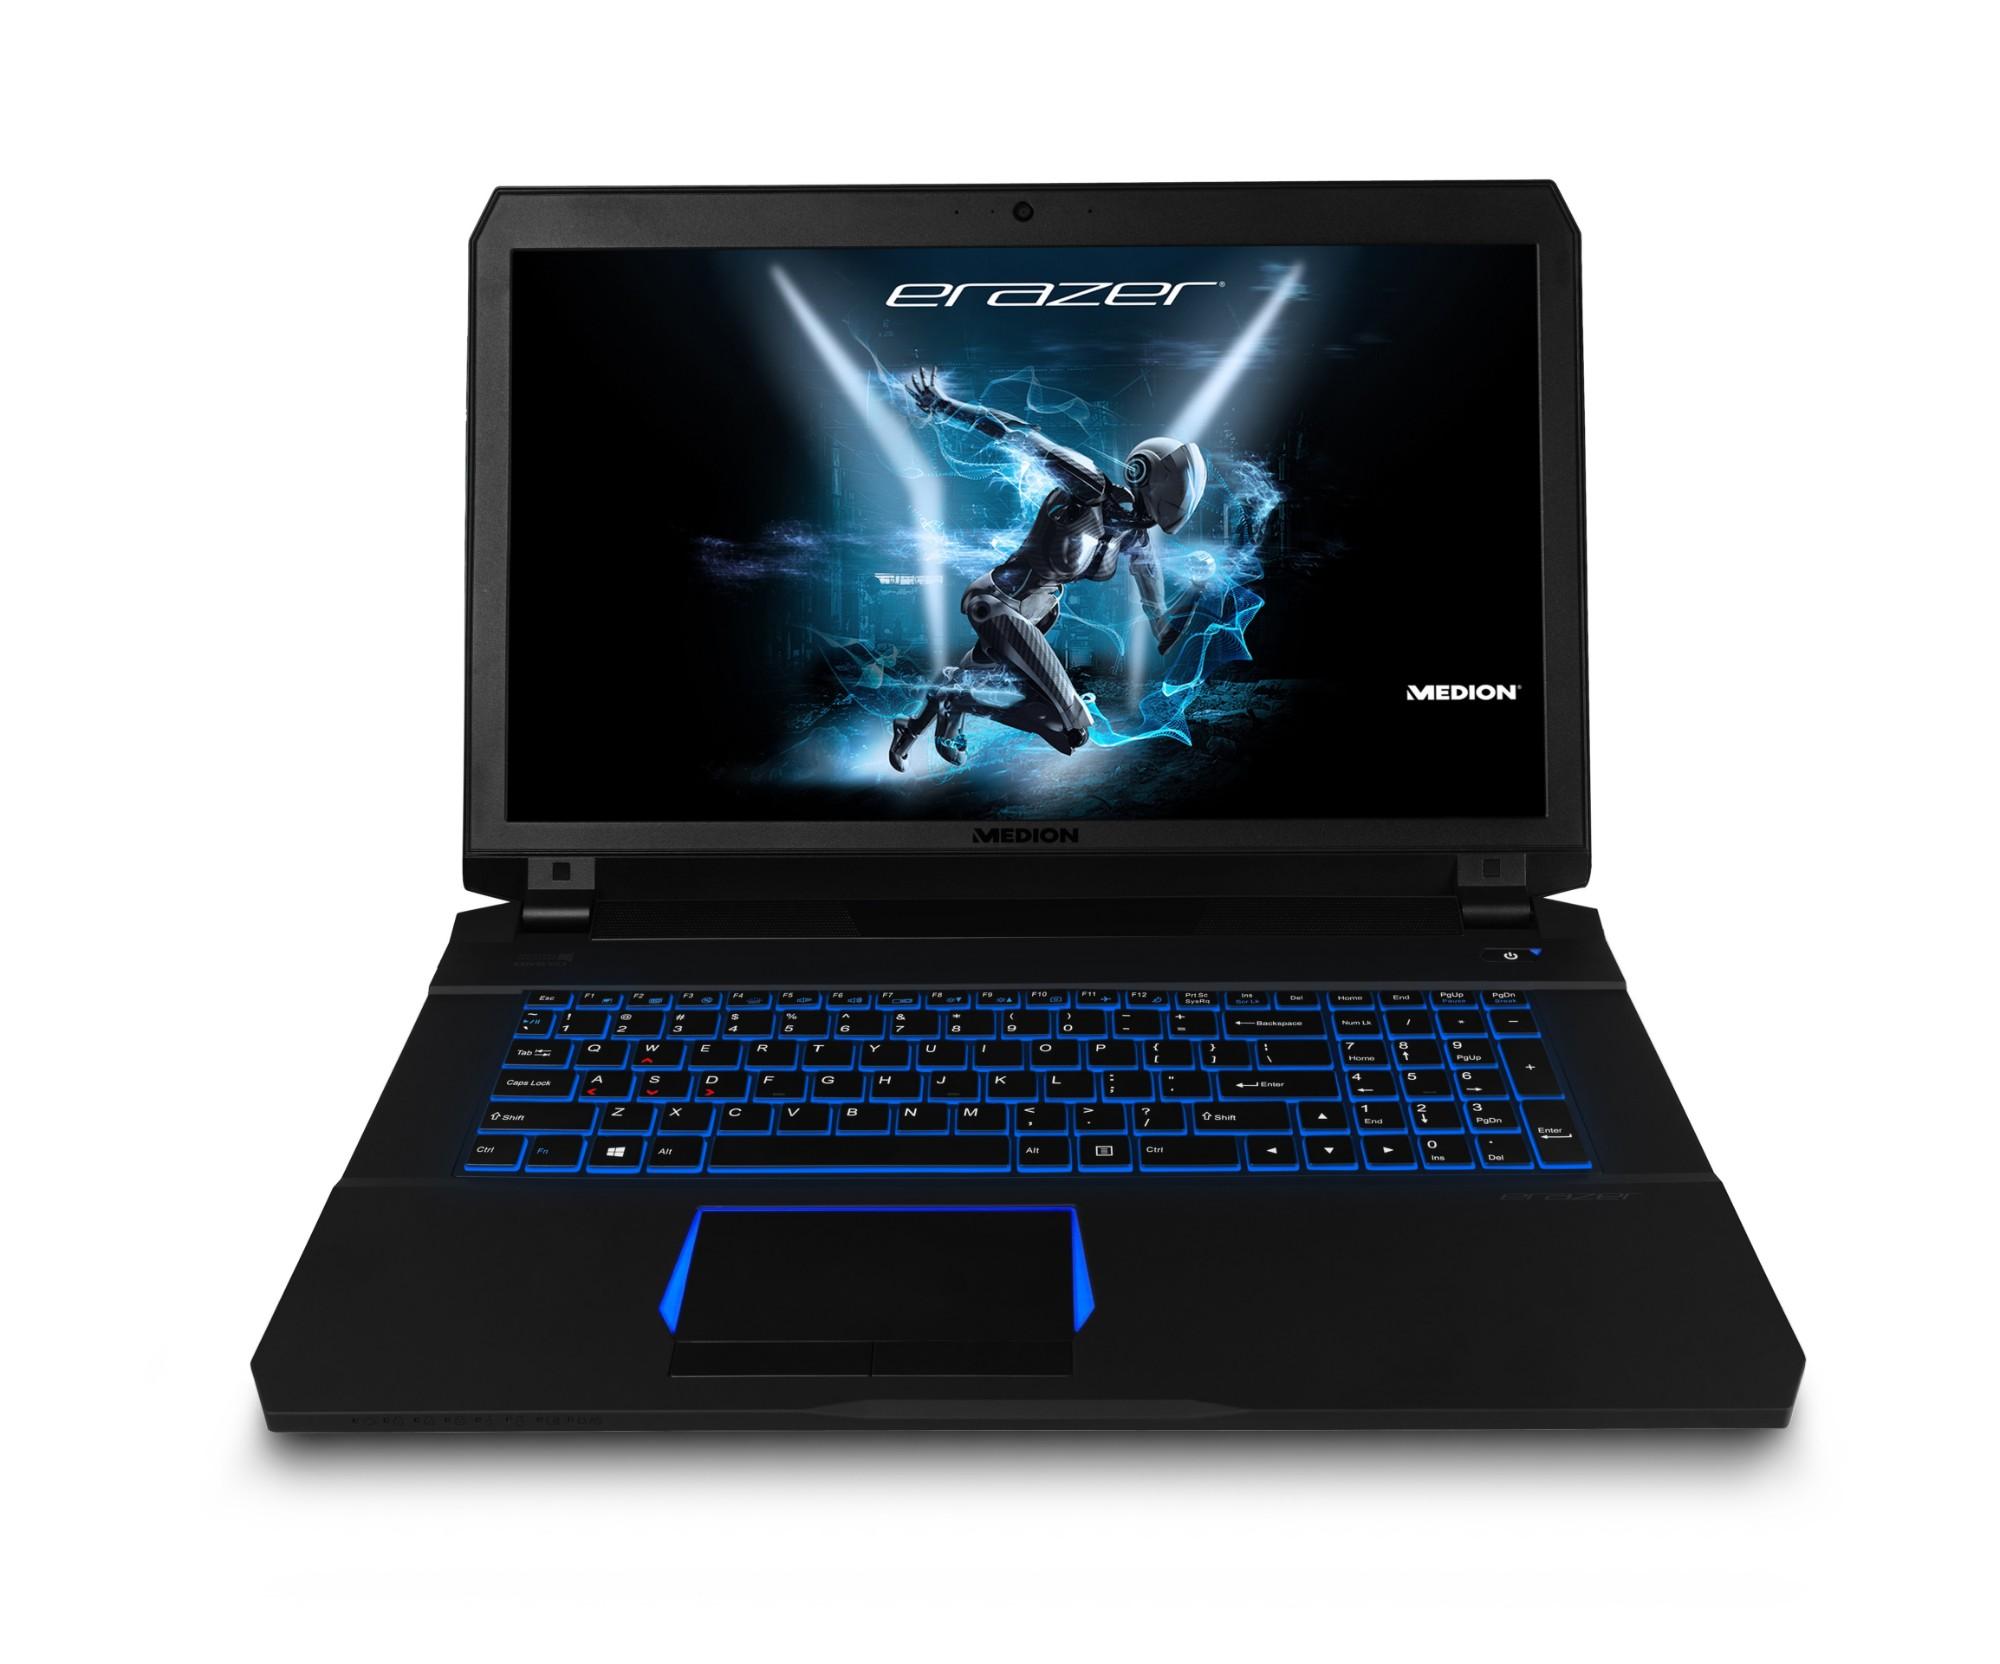 "MEDION ERAZER X7851 Notebook Black 43.9 cm (17.3"") 1920 x 1080 pixels 7th gen Intel® Core�""� i5 8 G"